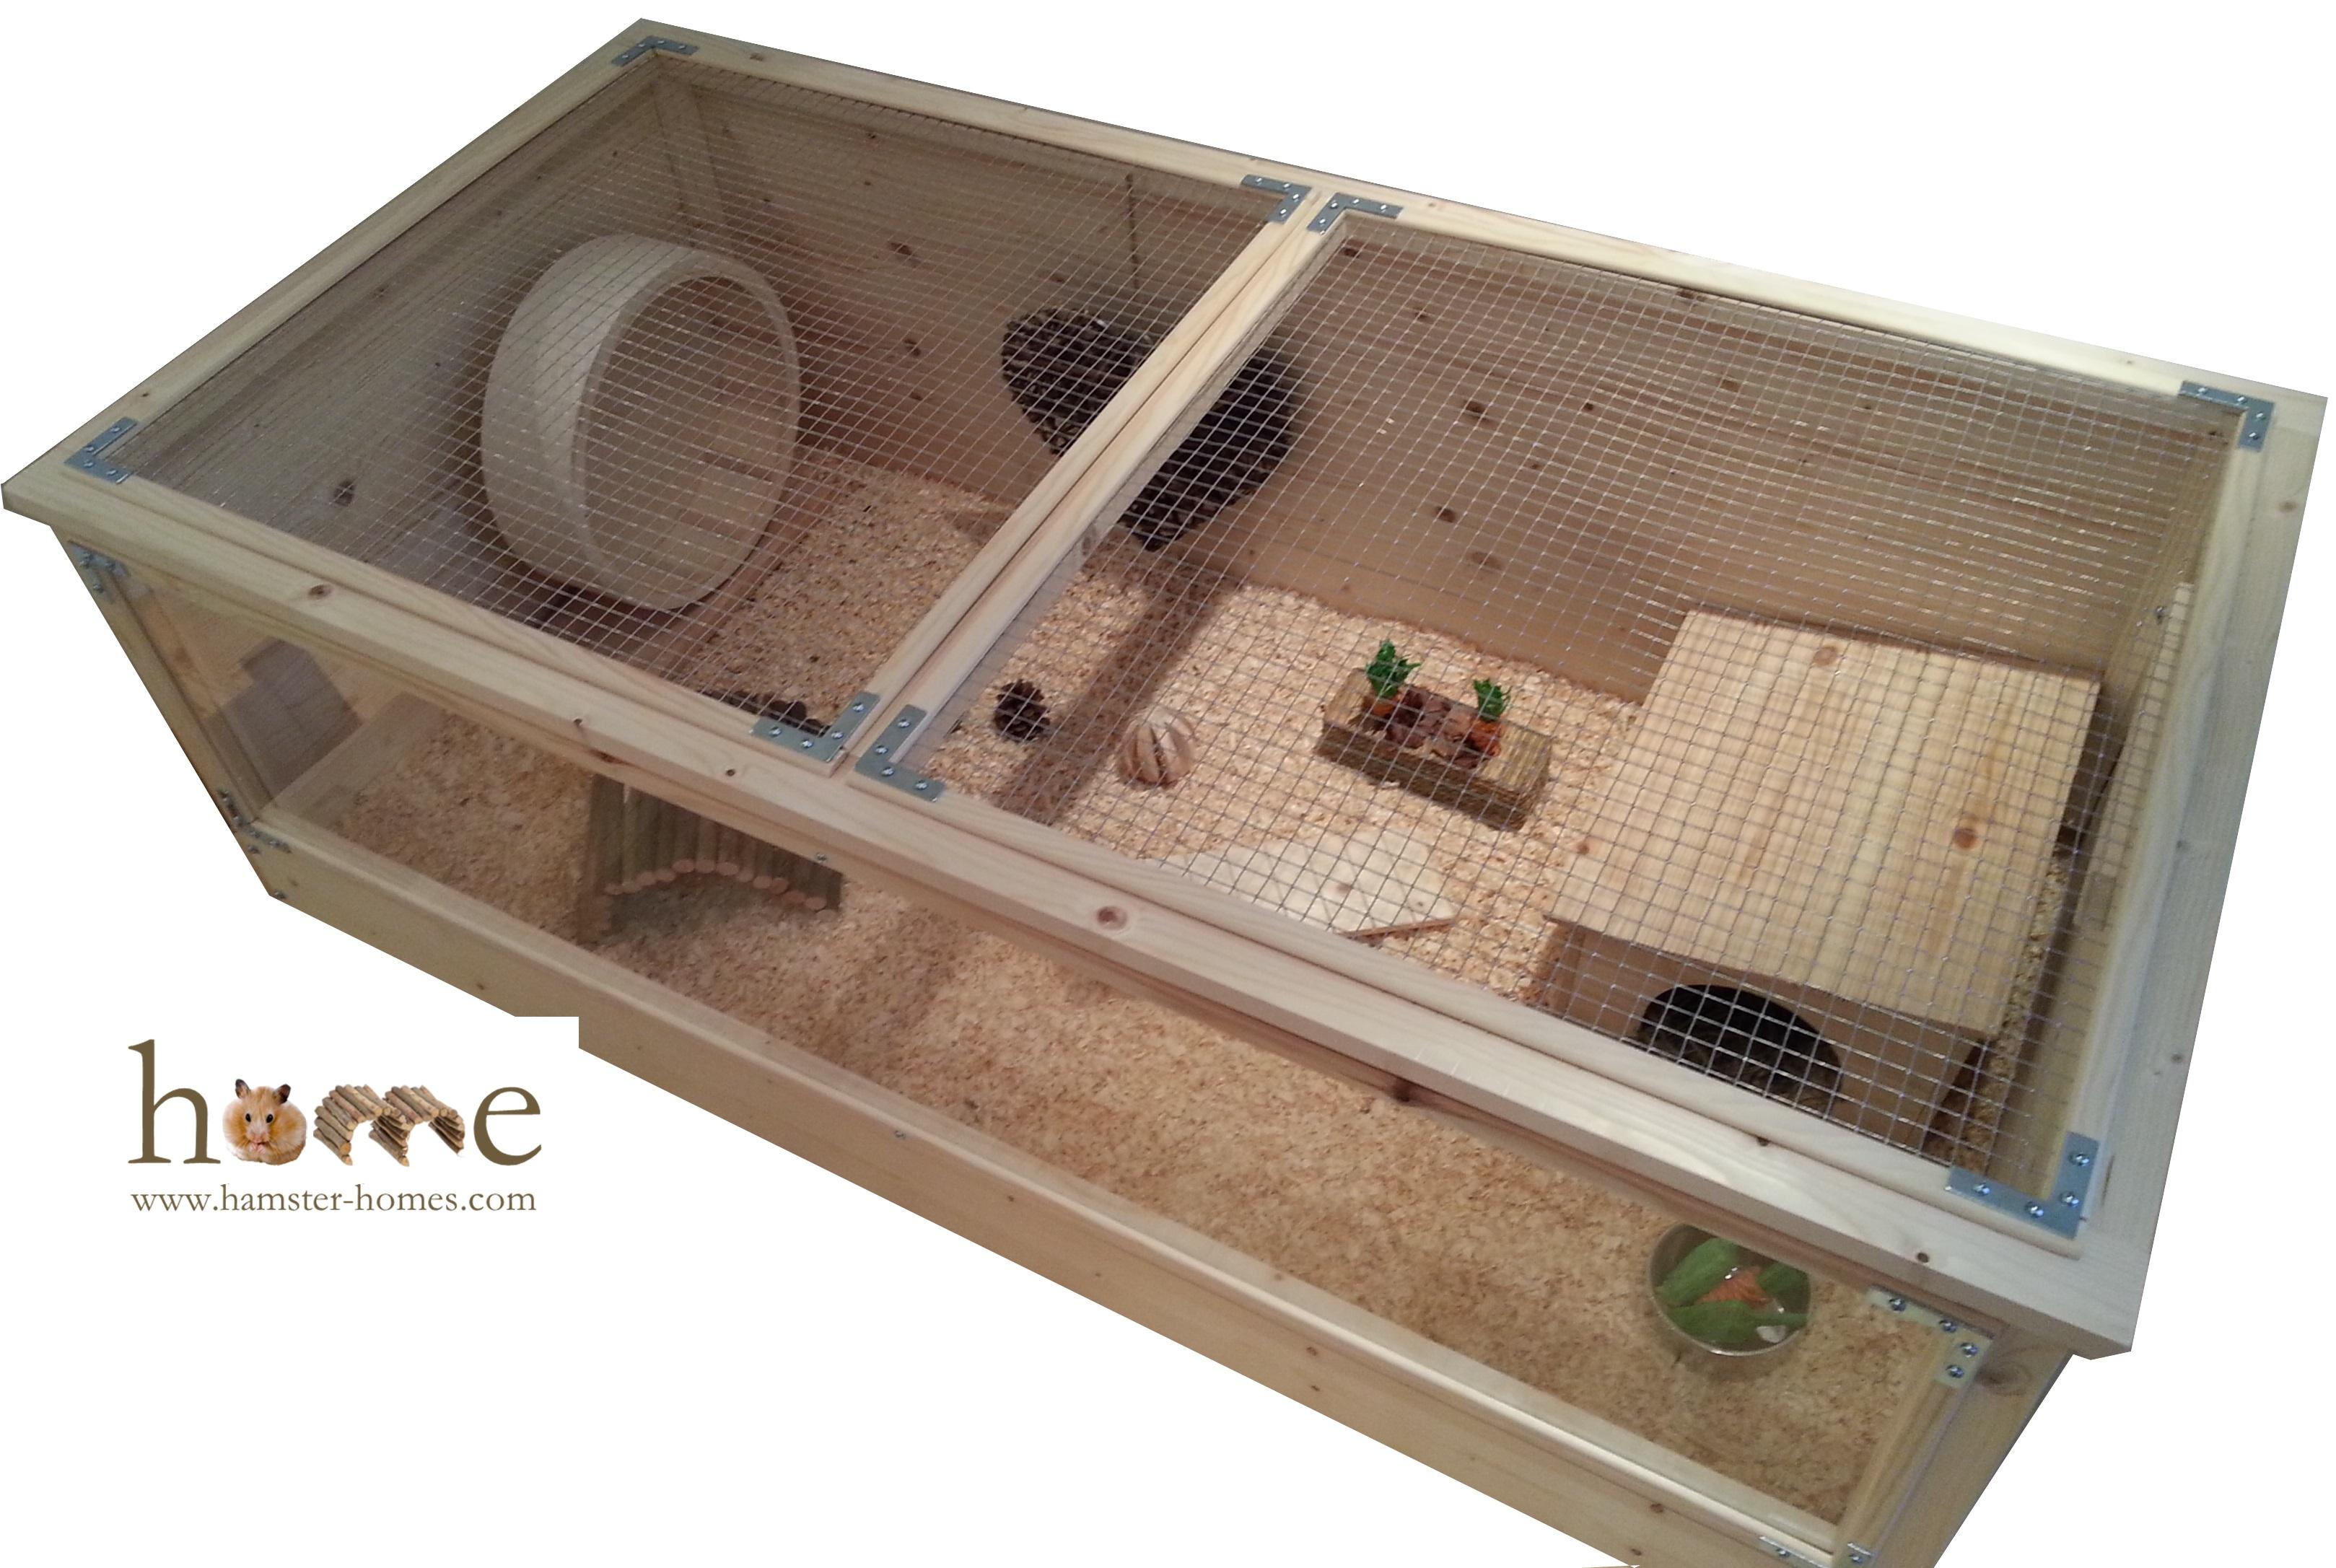 Super Large 120x60cm Hedgehog Cage & Exotic Pet Home Hedgehogs As Pets Cages